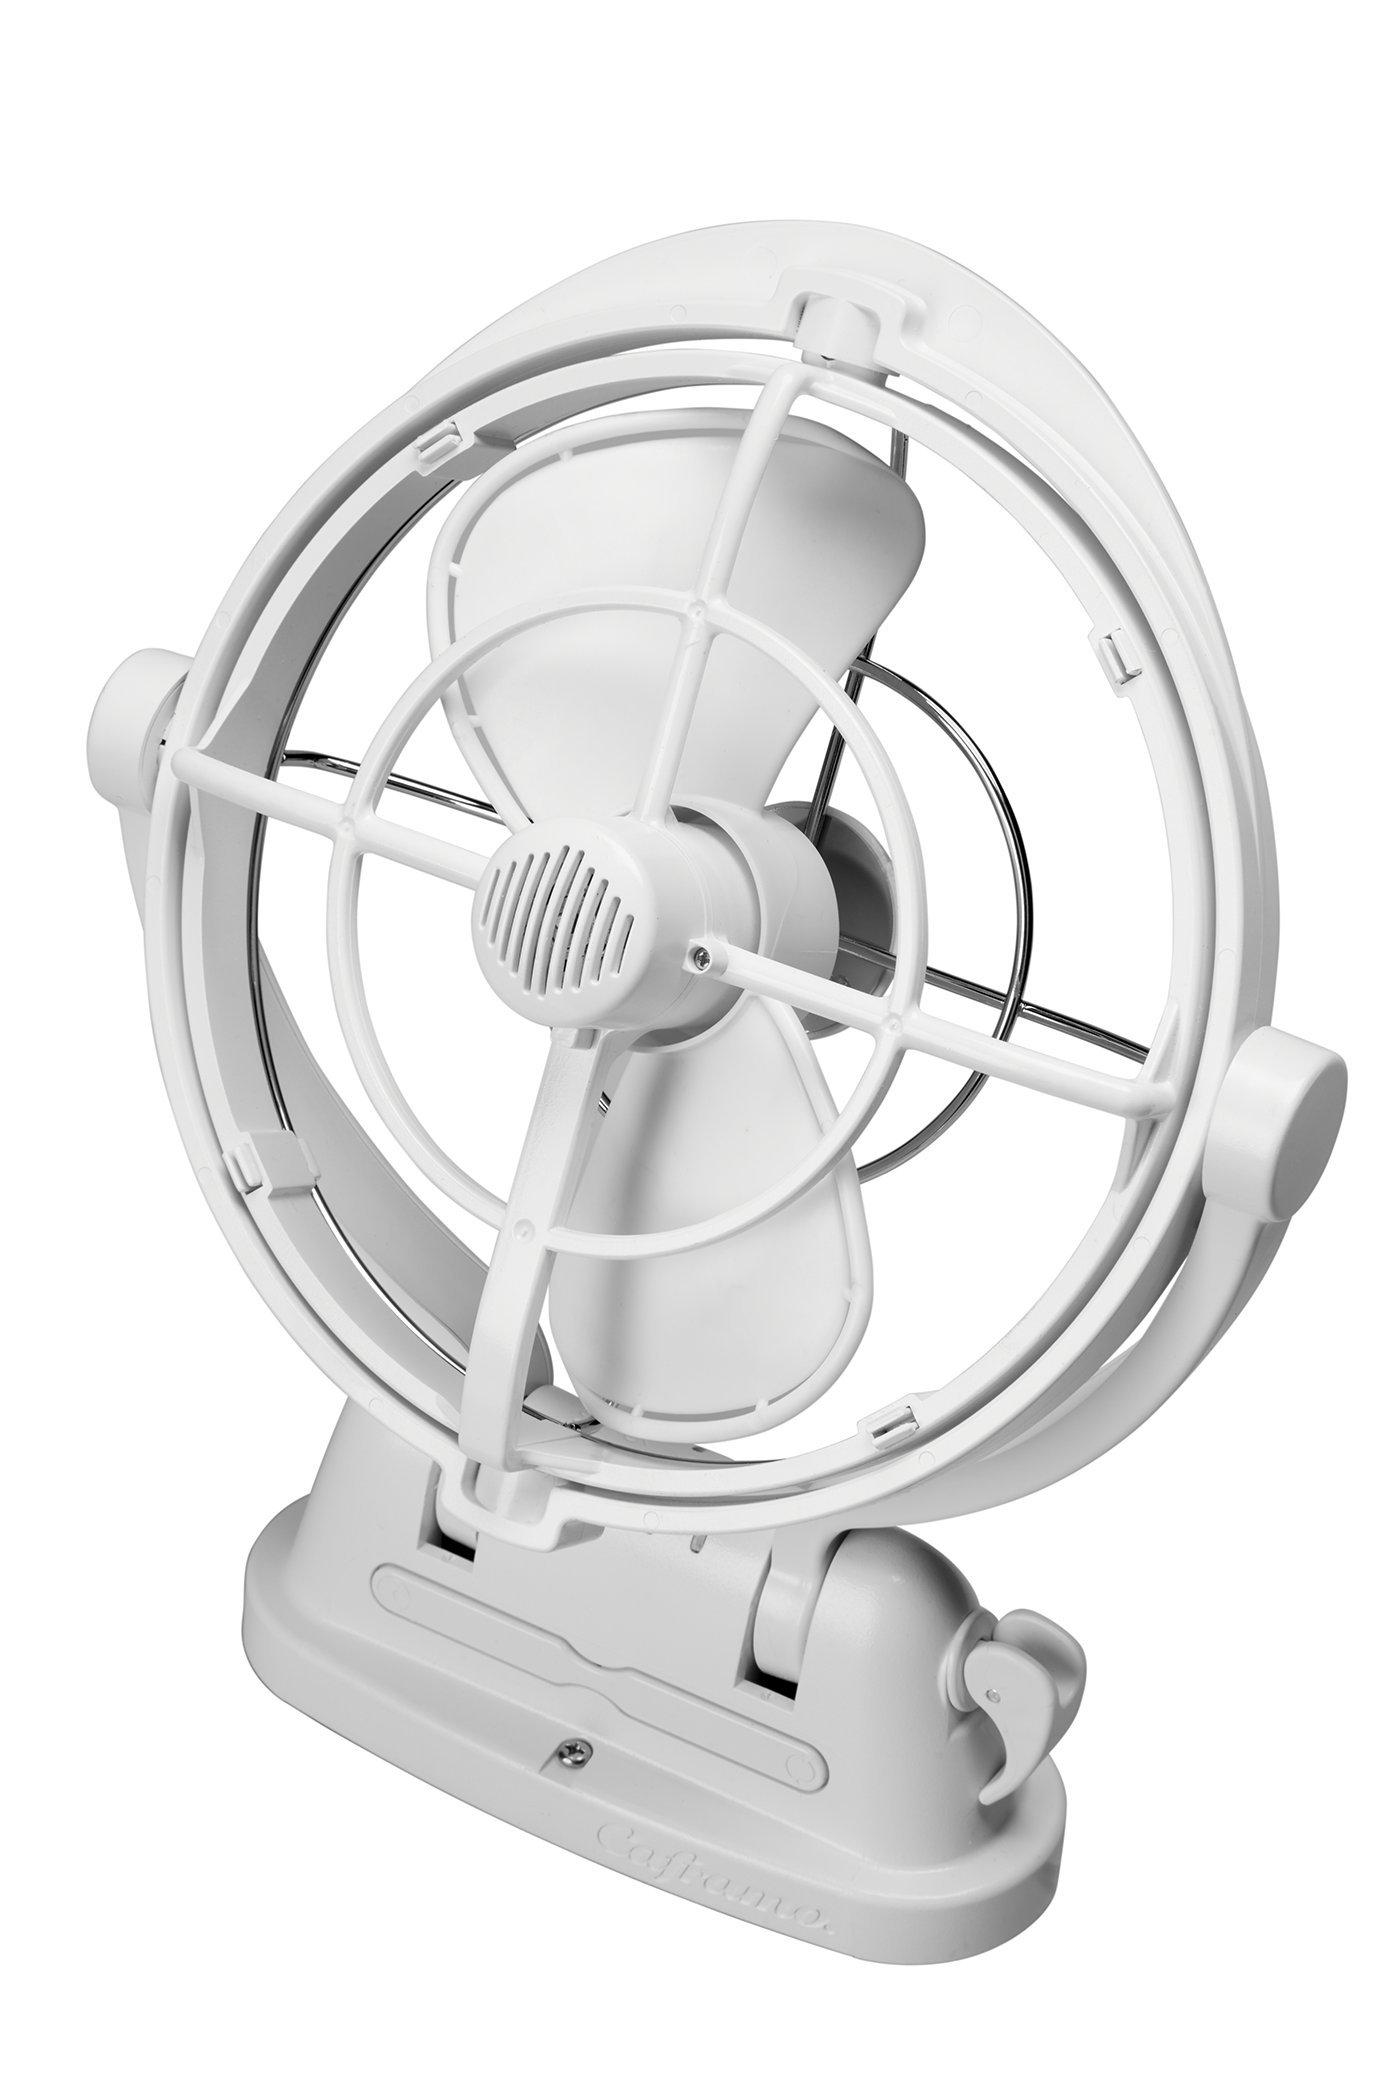 Caframo Sirocco II 12/24V Gimbal Fan, One Size, White by Caframo Sirocco (Image #1)